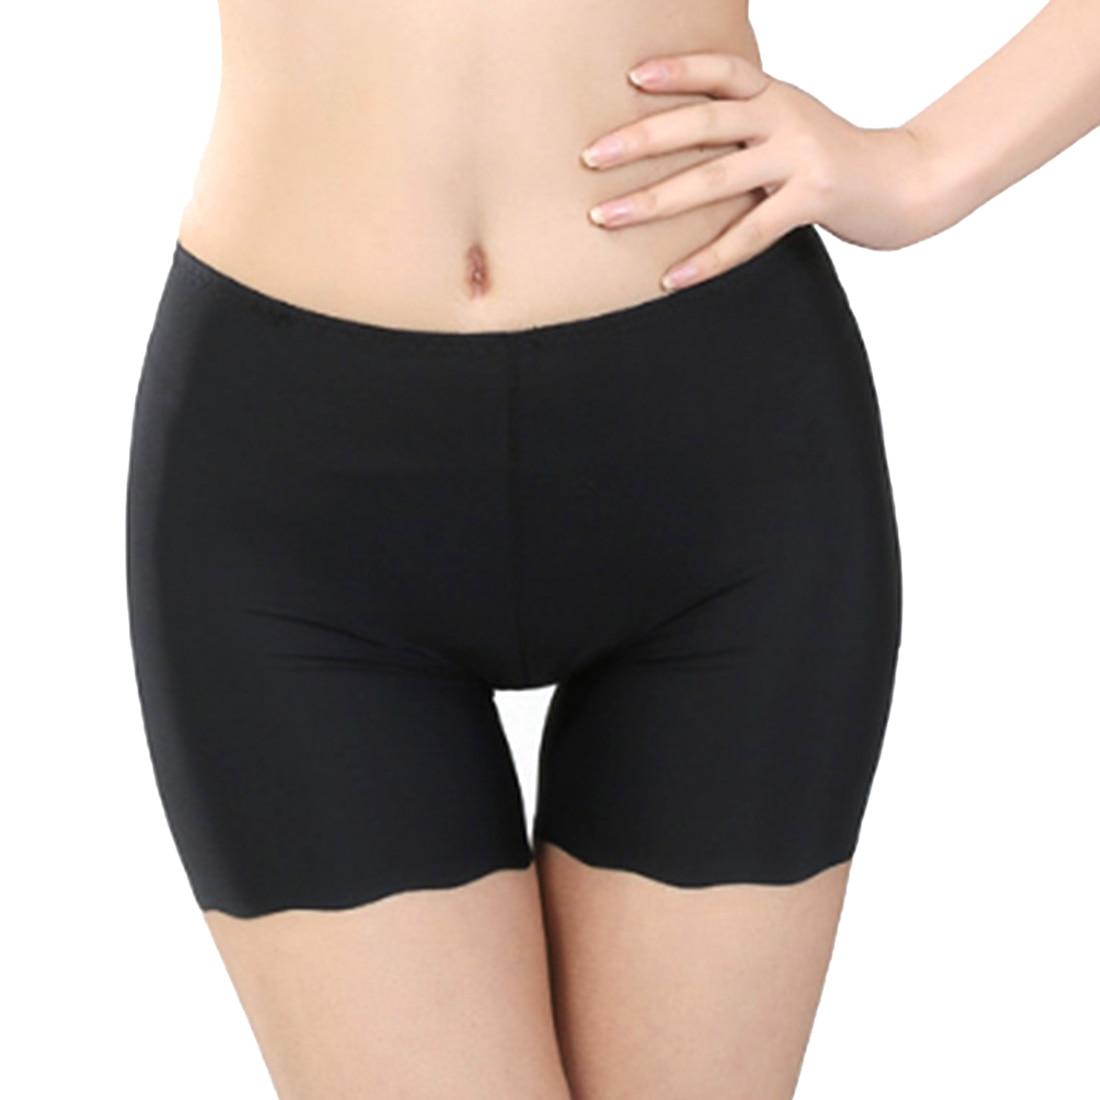 Women Lady Pants Short Skirt Under Short   Leggings   Briefs Seamless Pants Elastic   Leggings   Jammers